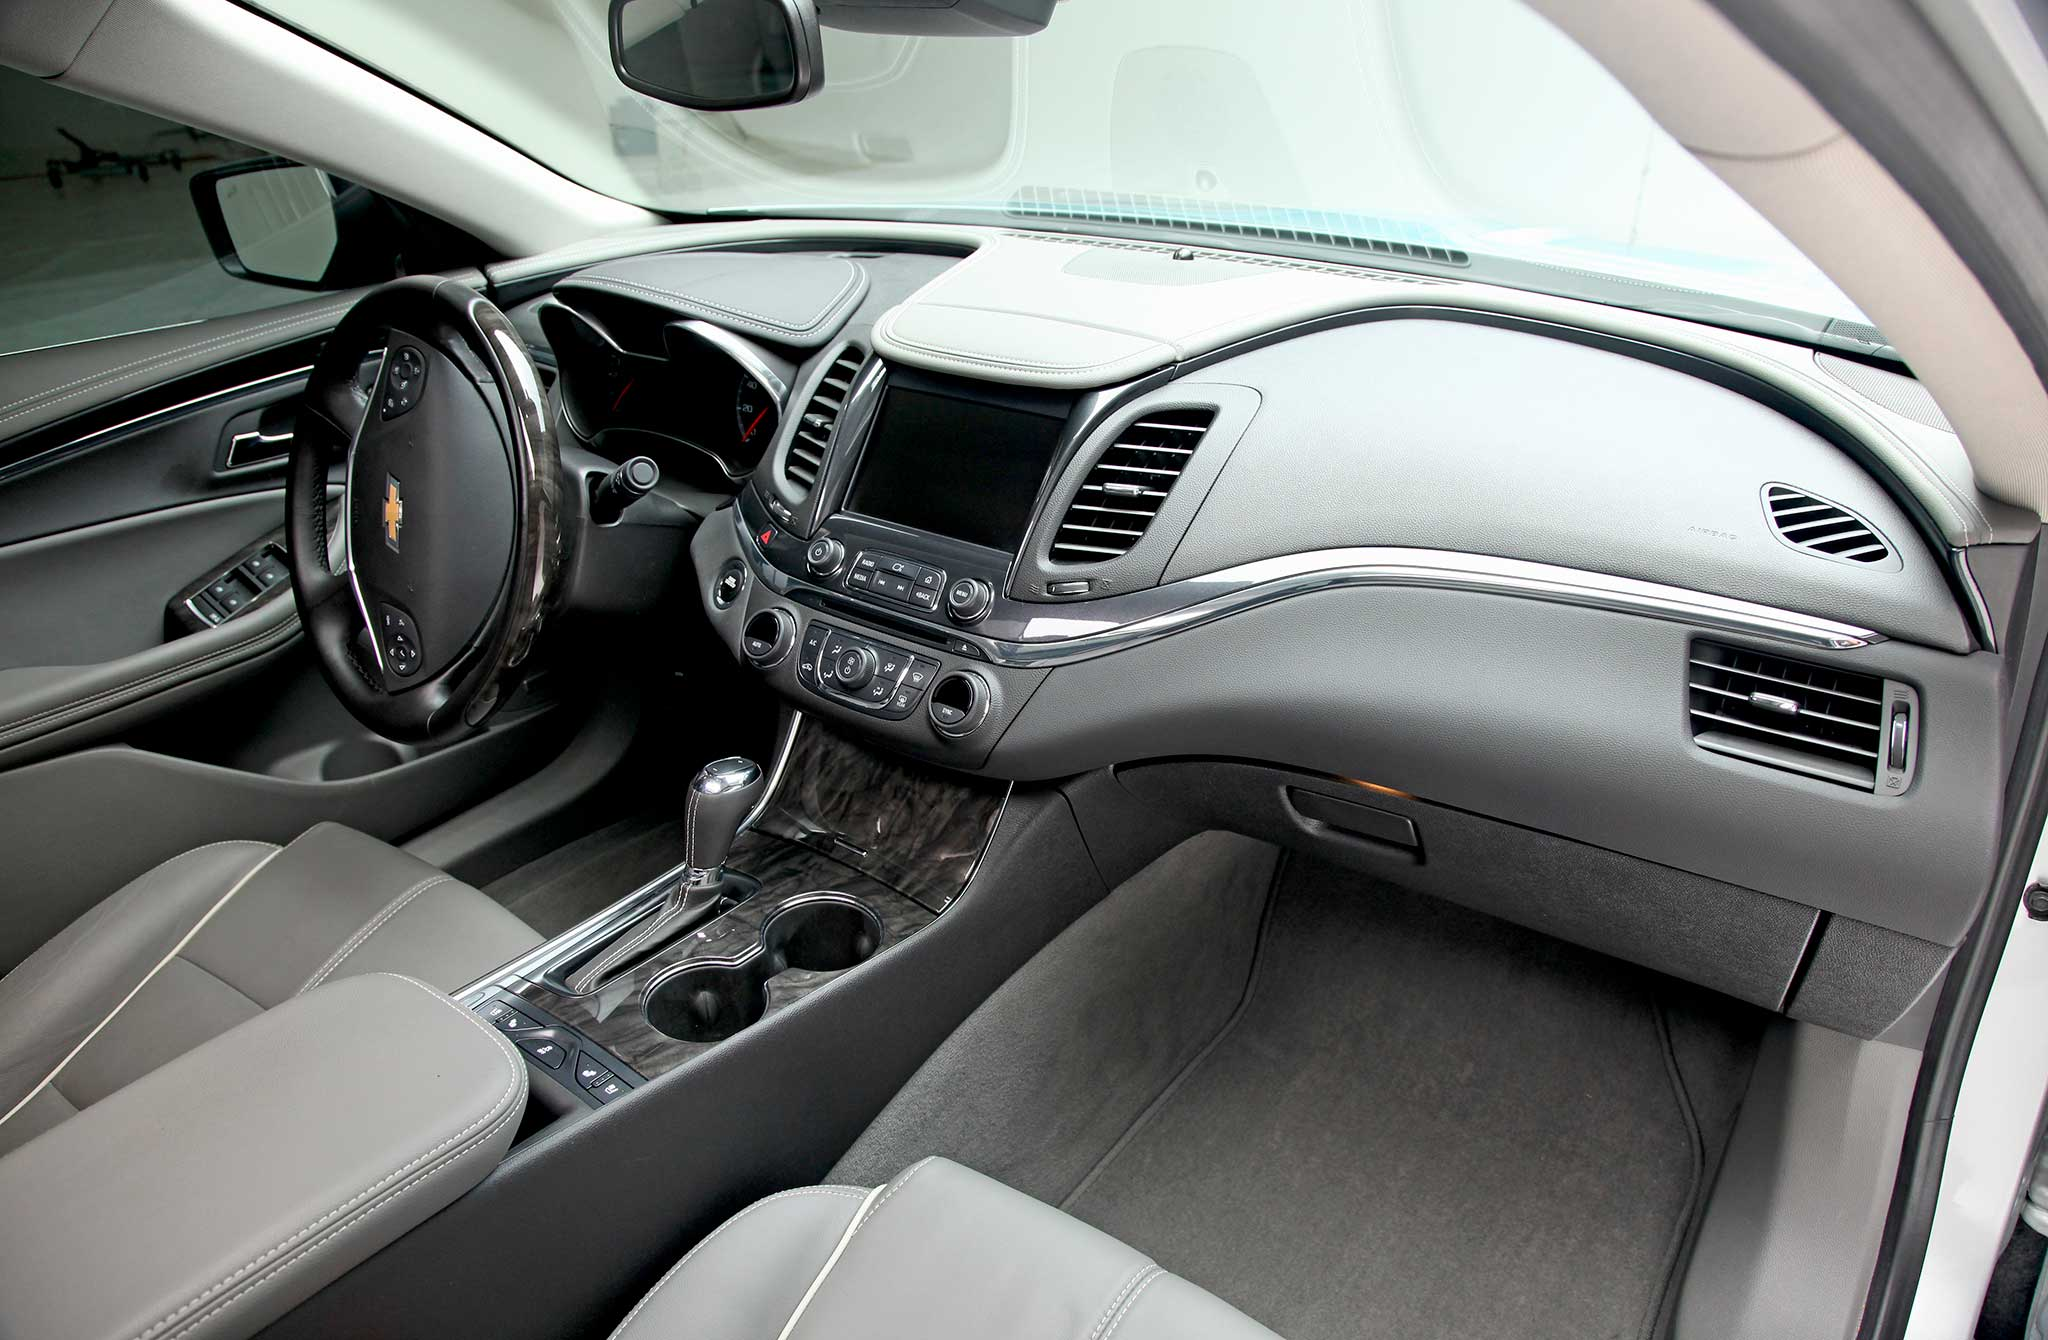 2014 Chevrolet Impala - Generation X - Lowrider